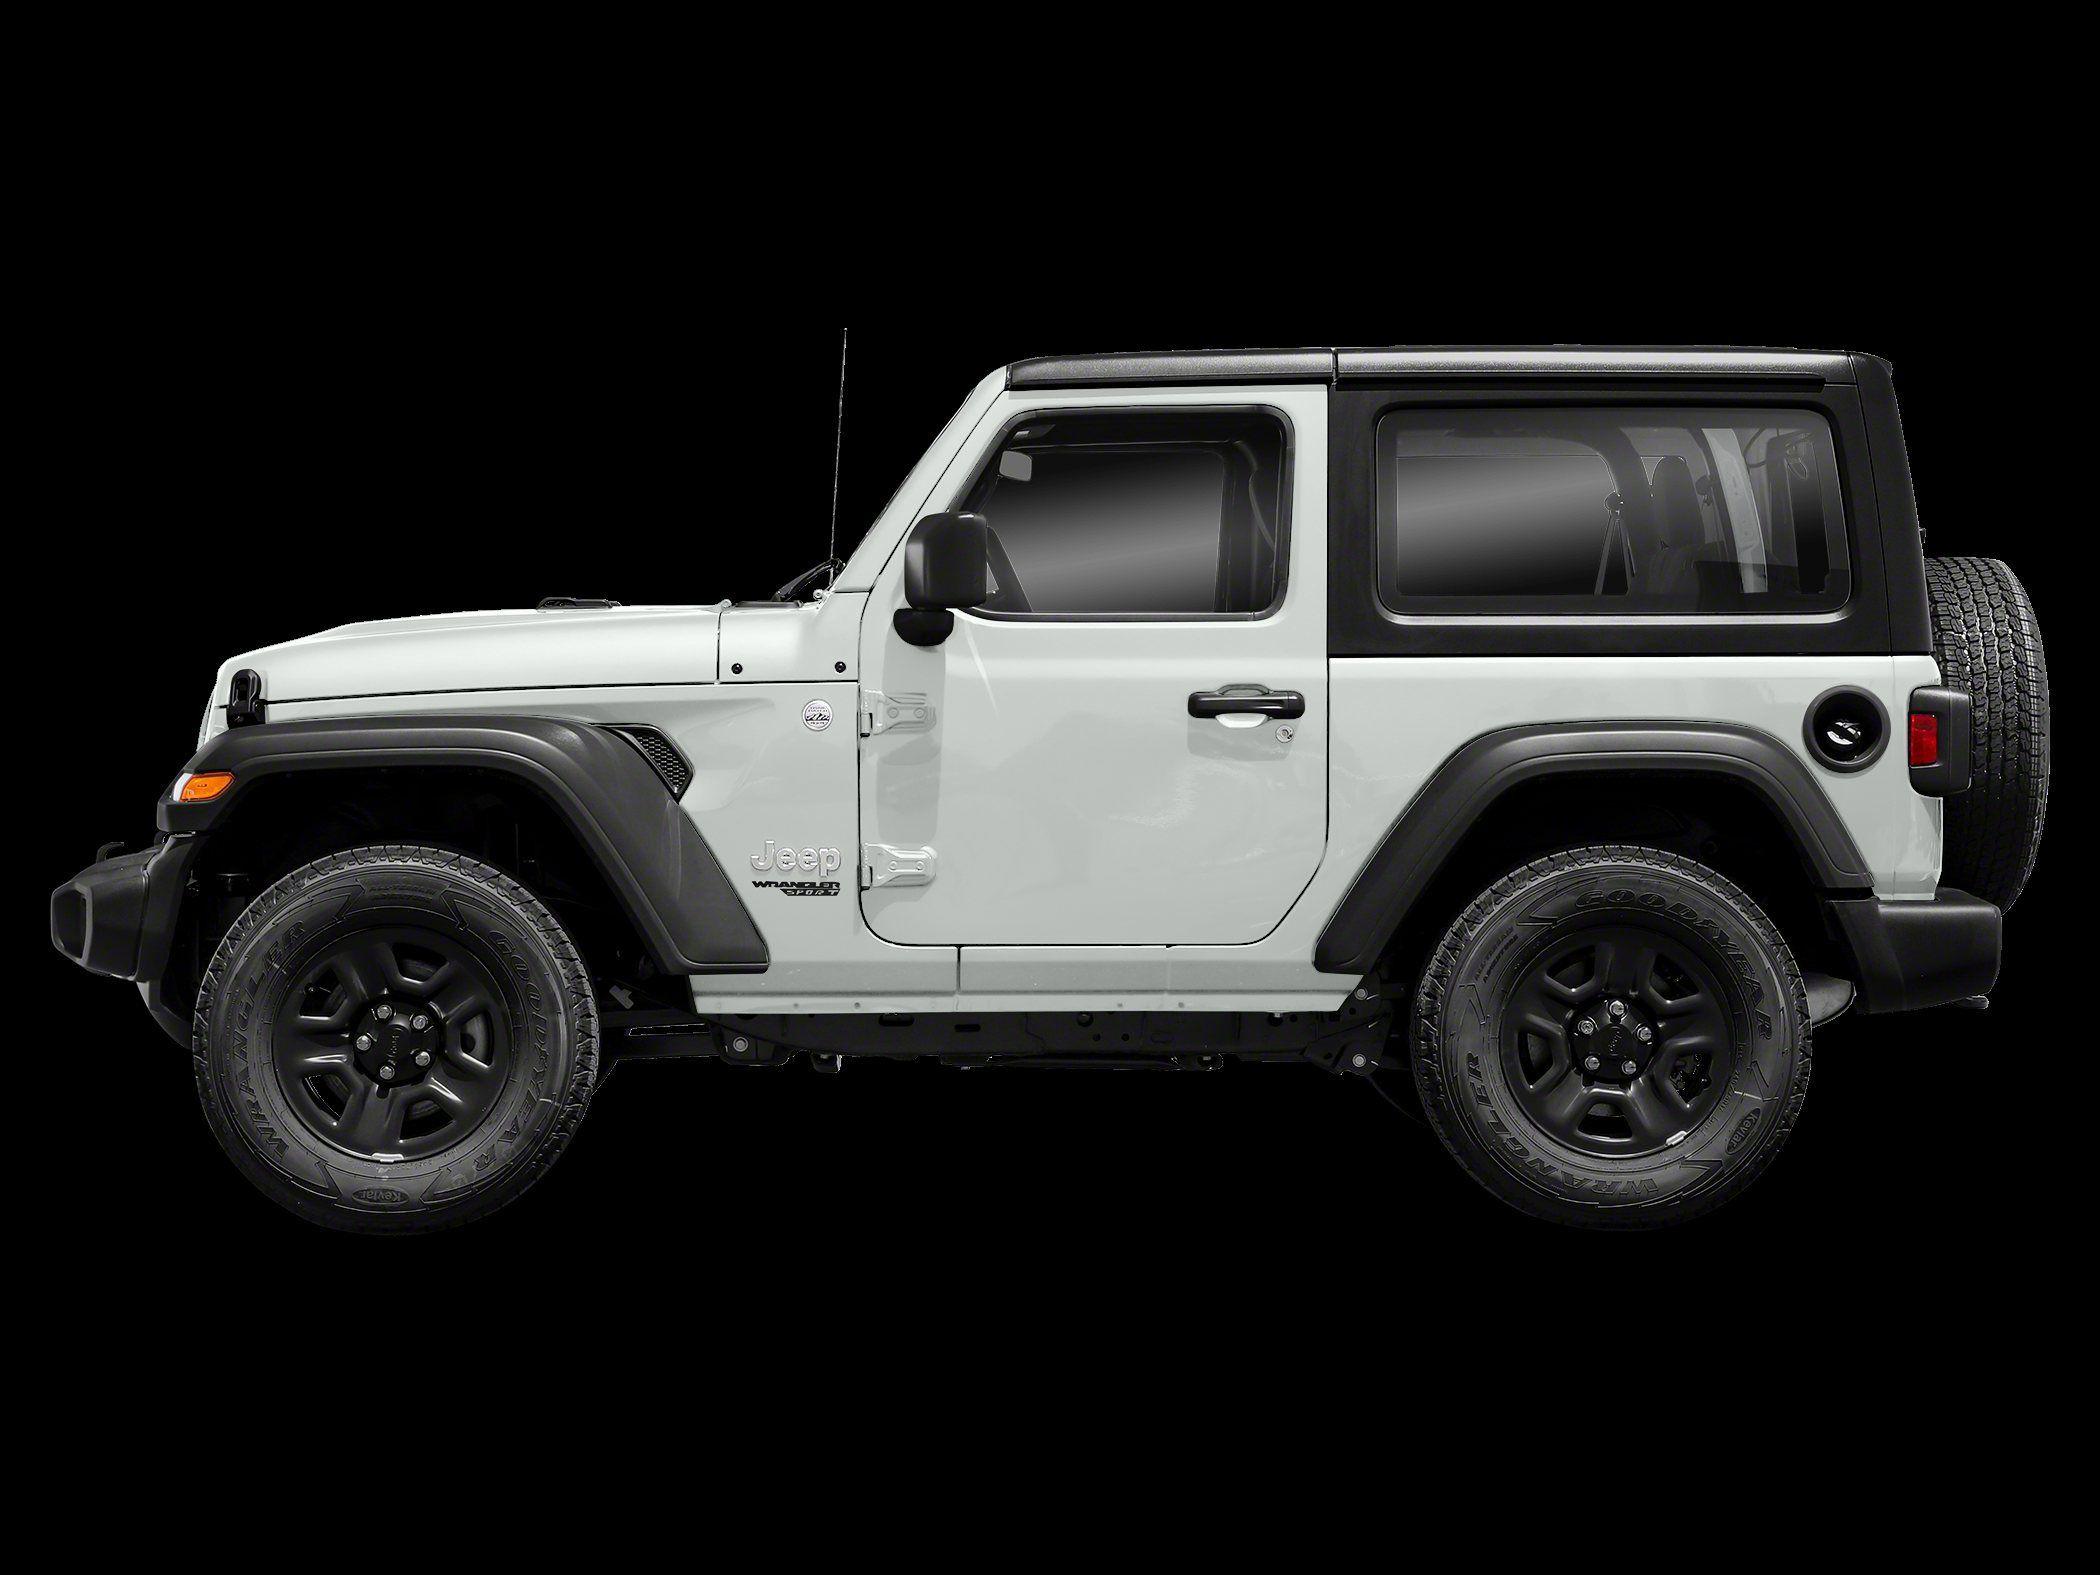 2020 Jeep Patriot Spesification in 2020 Jeep patriot